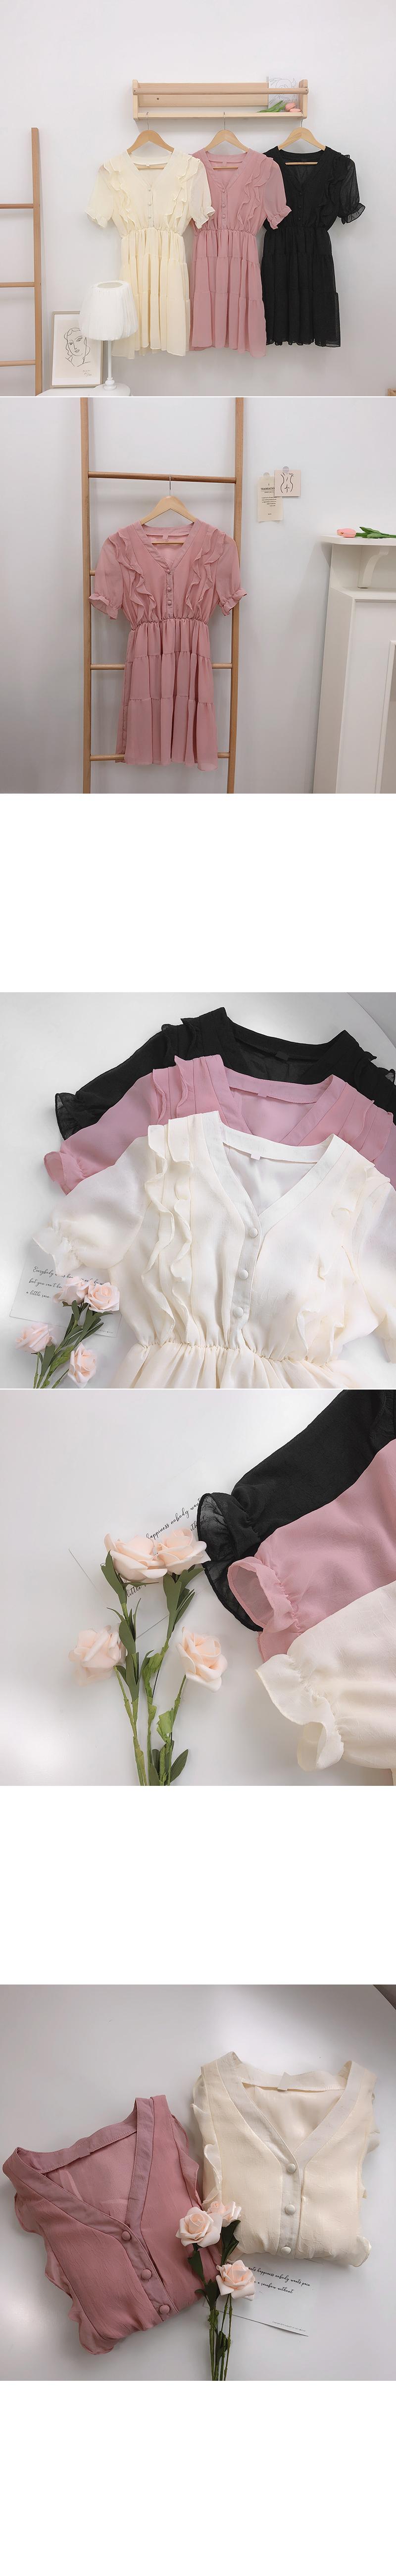 Chari frilled cancan Dress